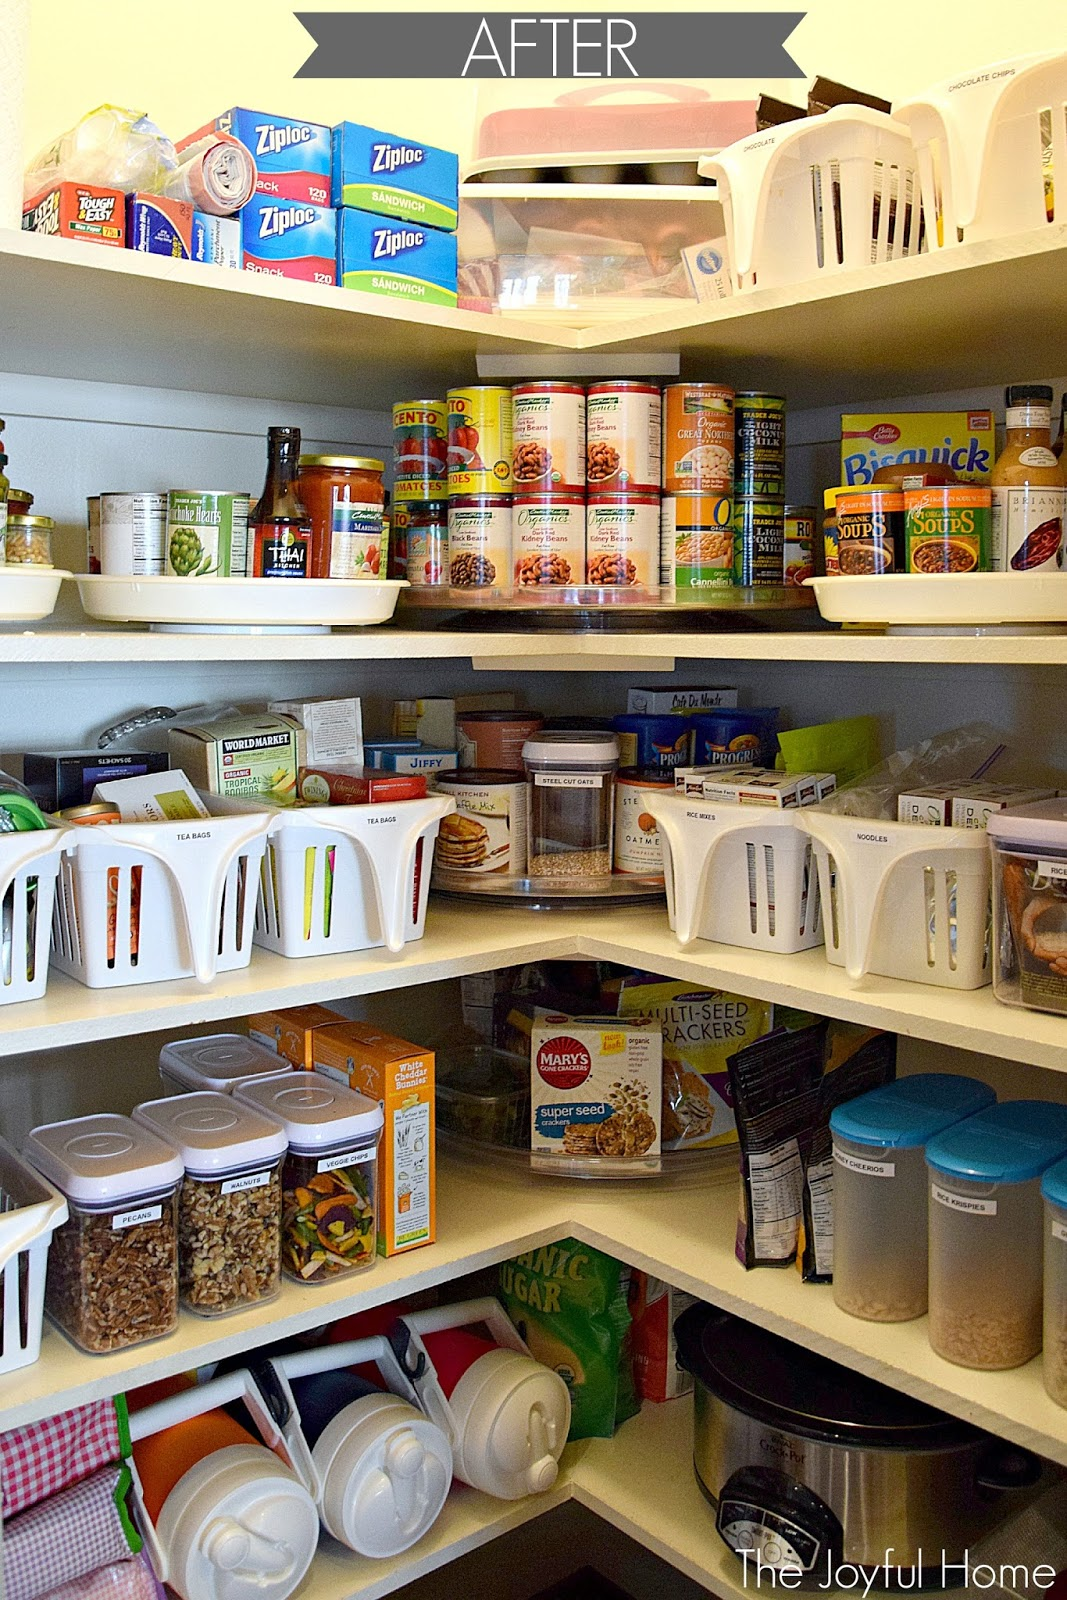 Organized Pantry and Fridge - The Joyful Home